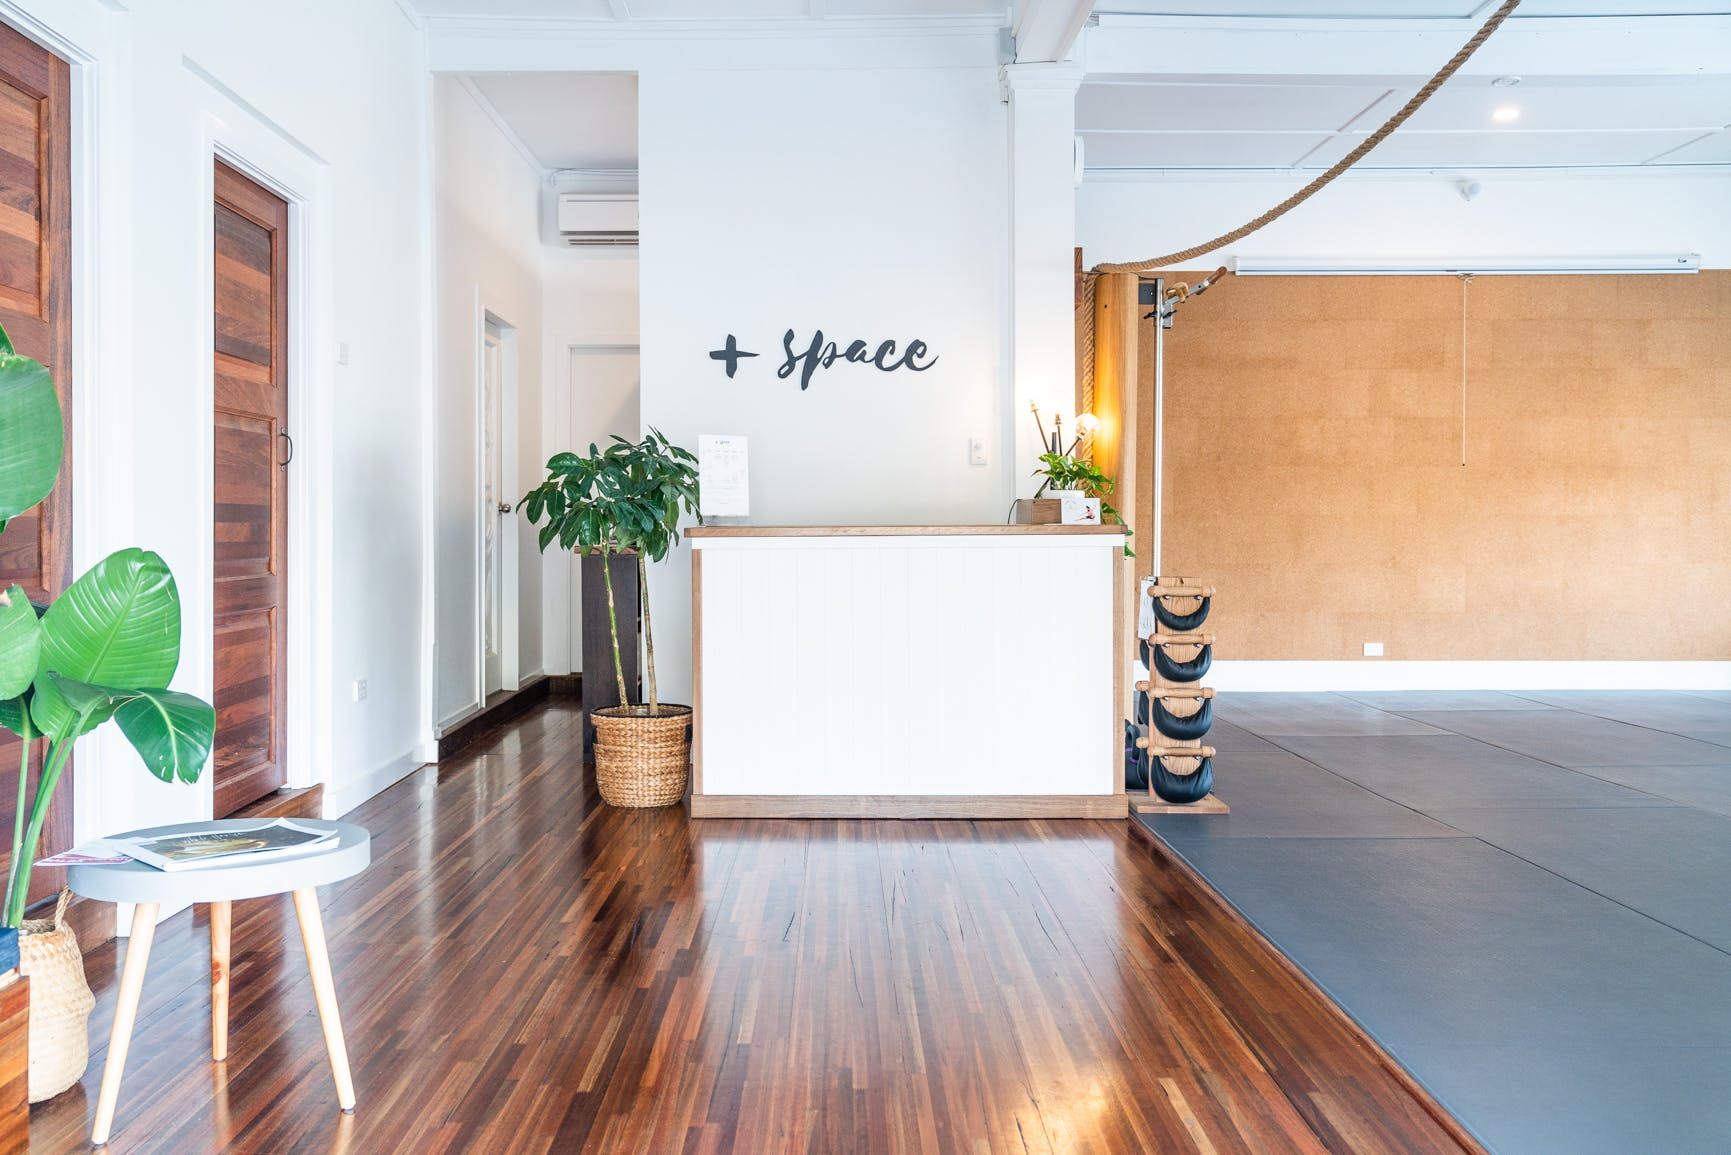 Studio Space, multi-use area at + space, image 1